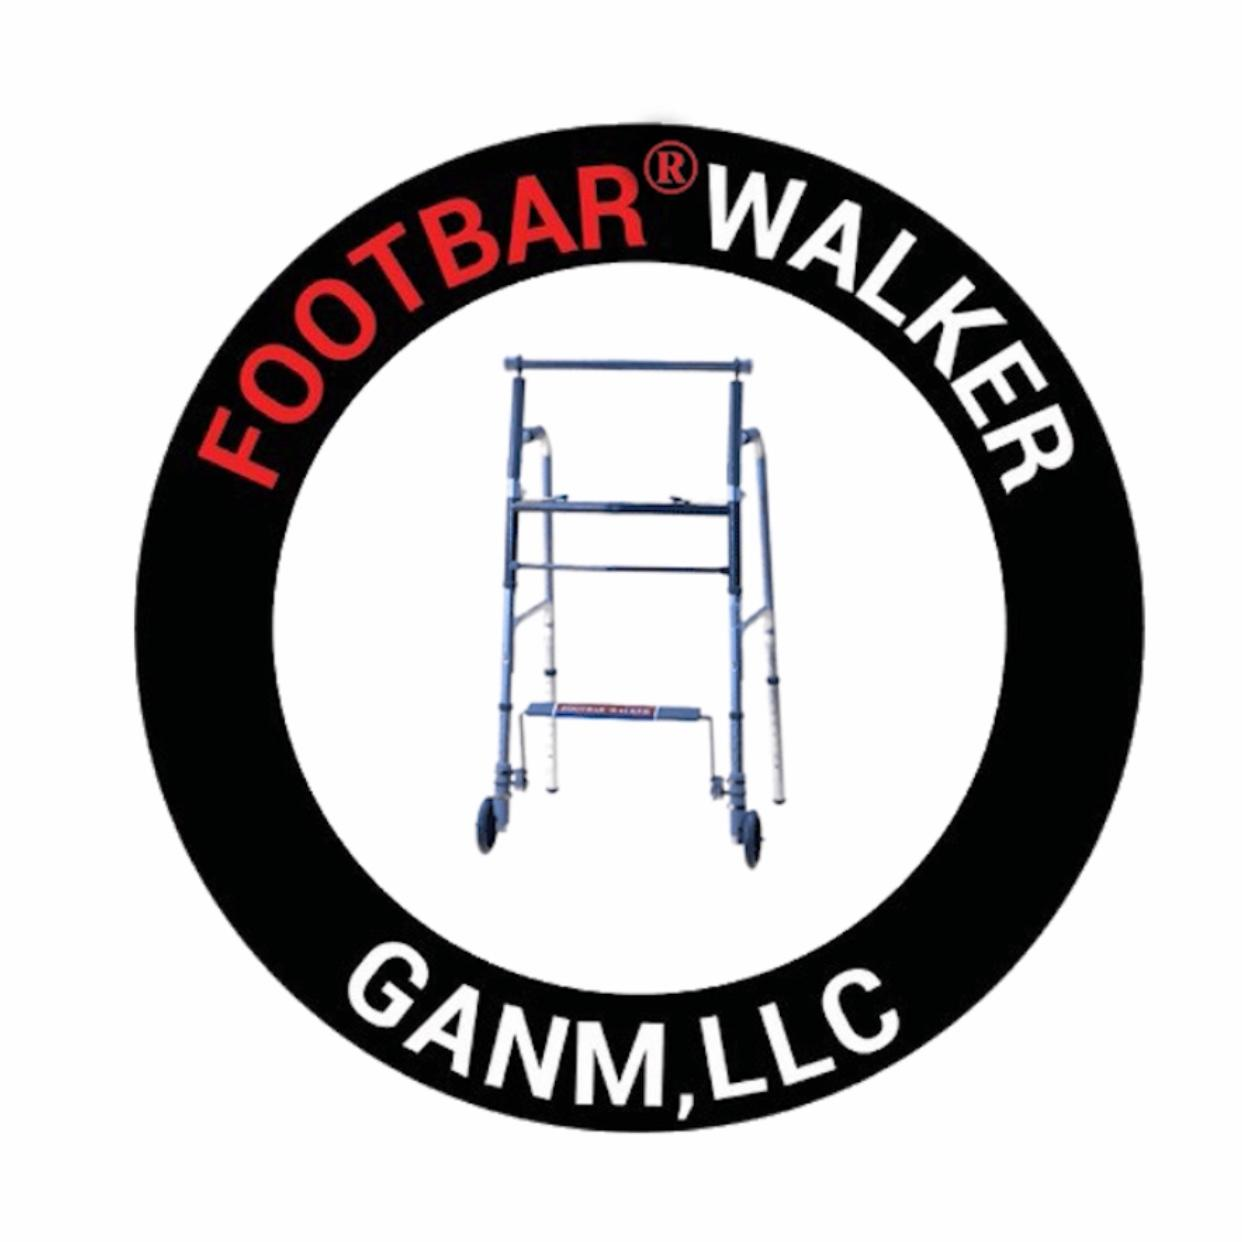 FOOTBAR® Walker  GANM, LLC image 0